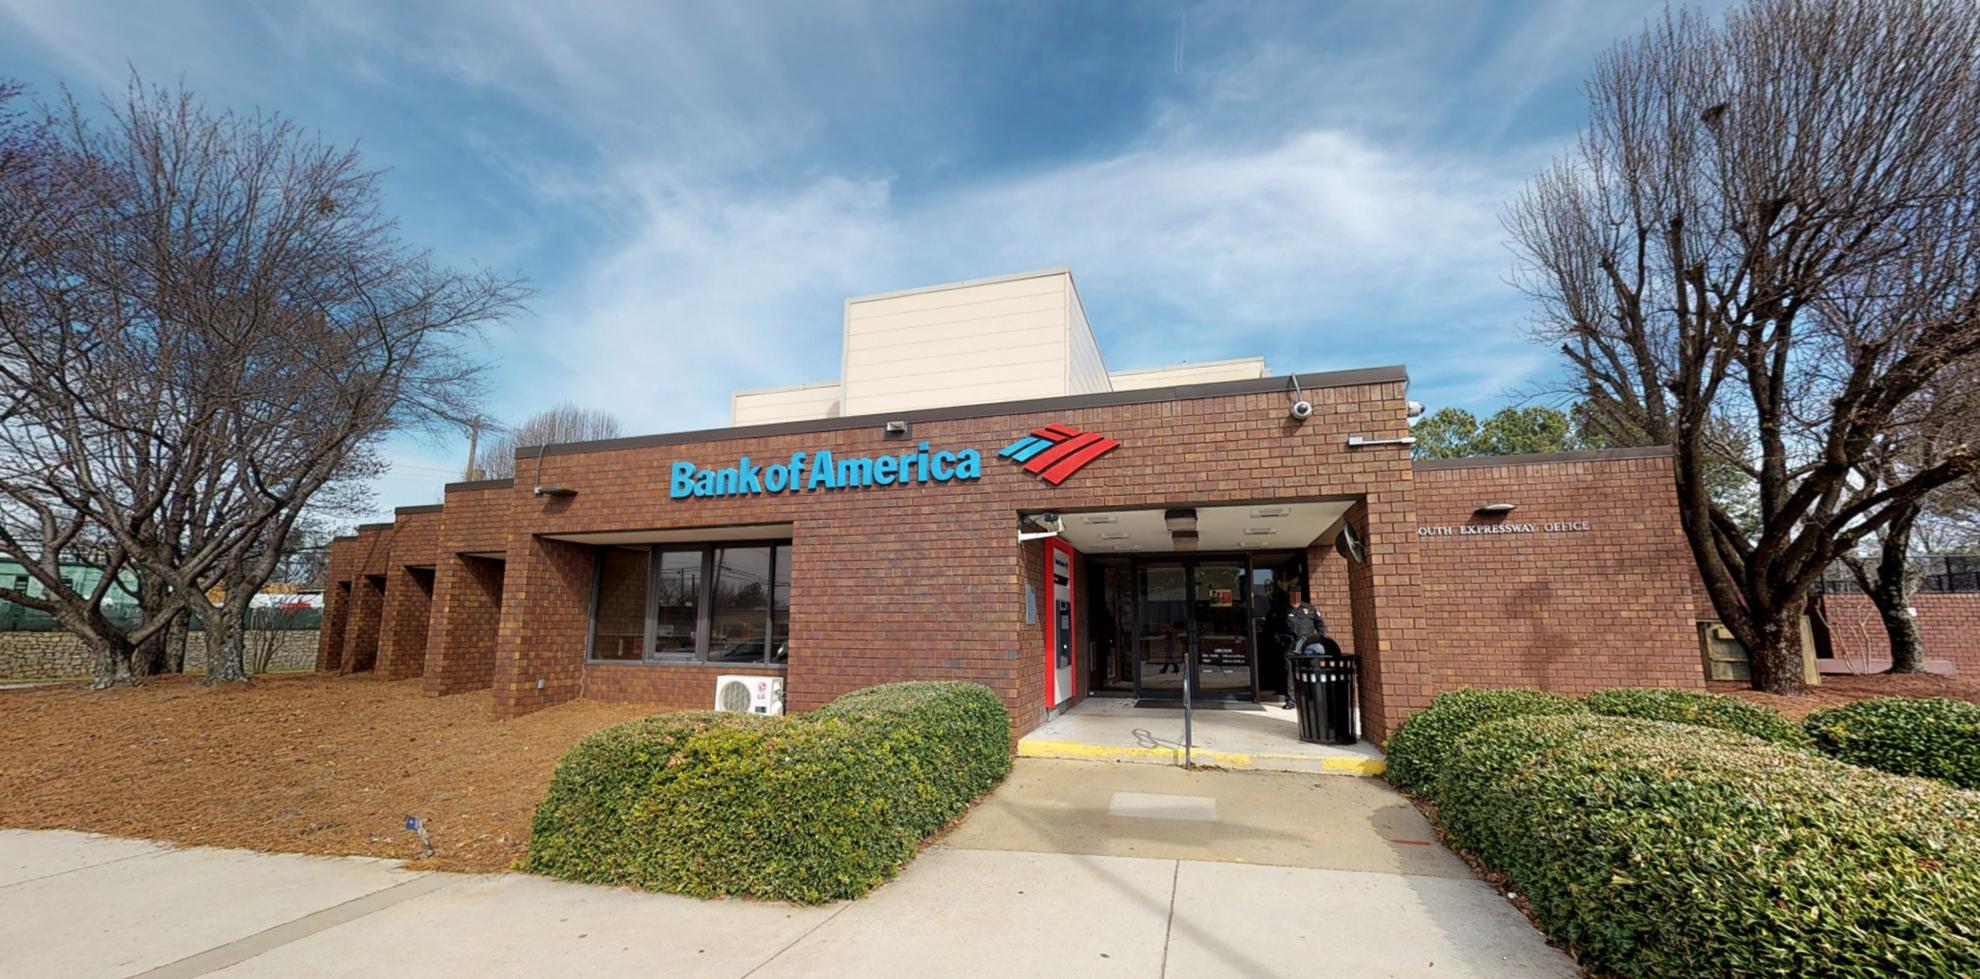 Bank of America drive-thru ATM | 3800 Browns Mill Rd Se, Atlanta, GA 30354